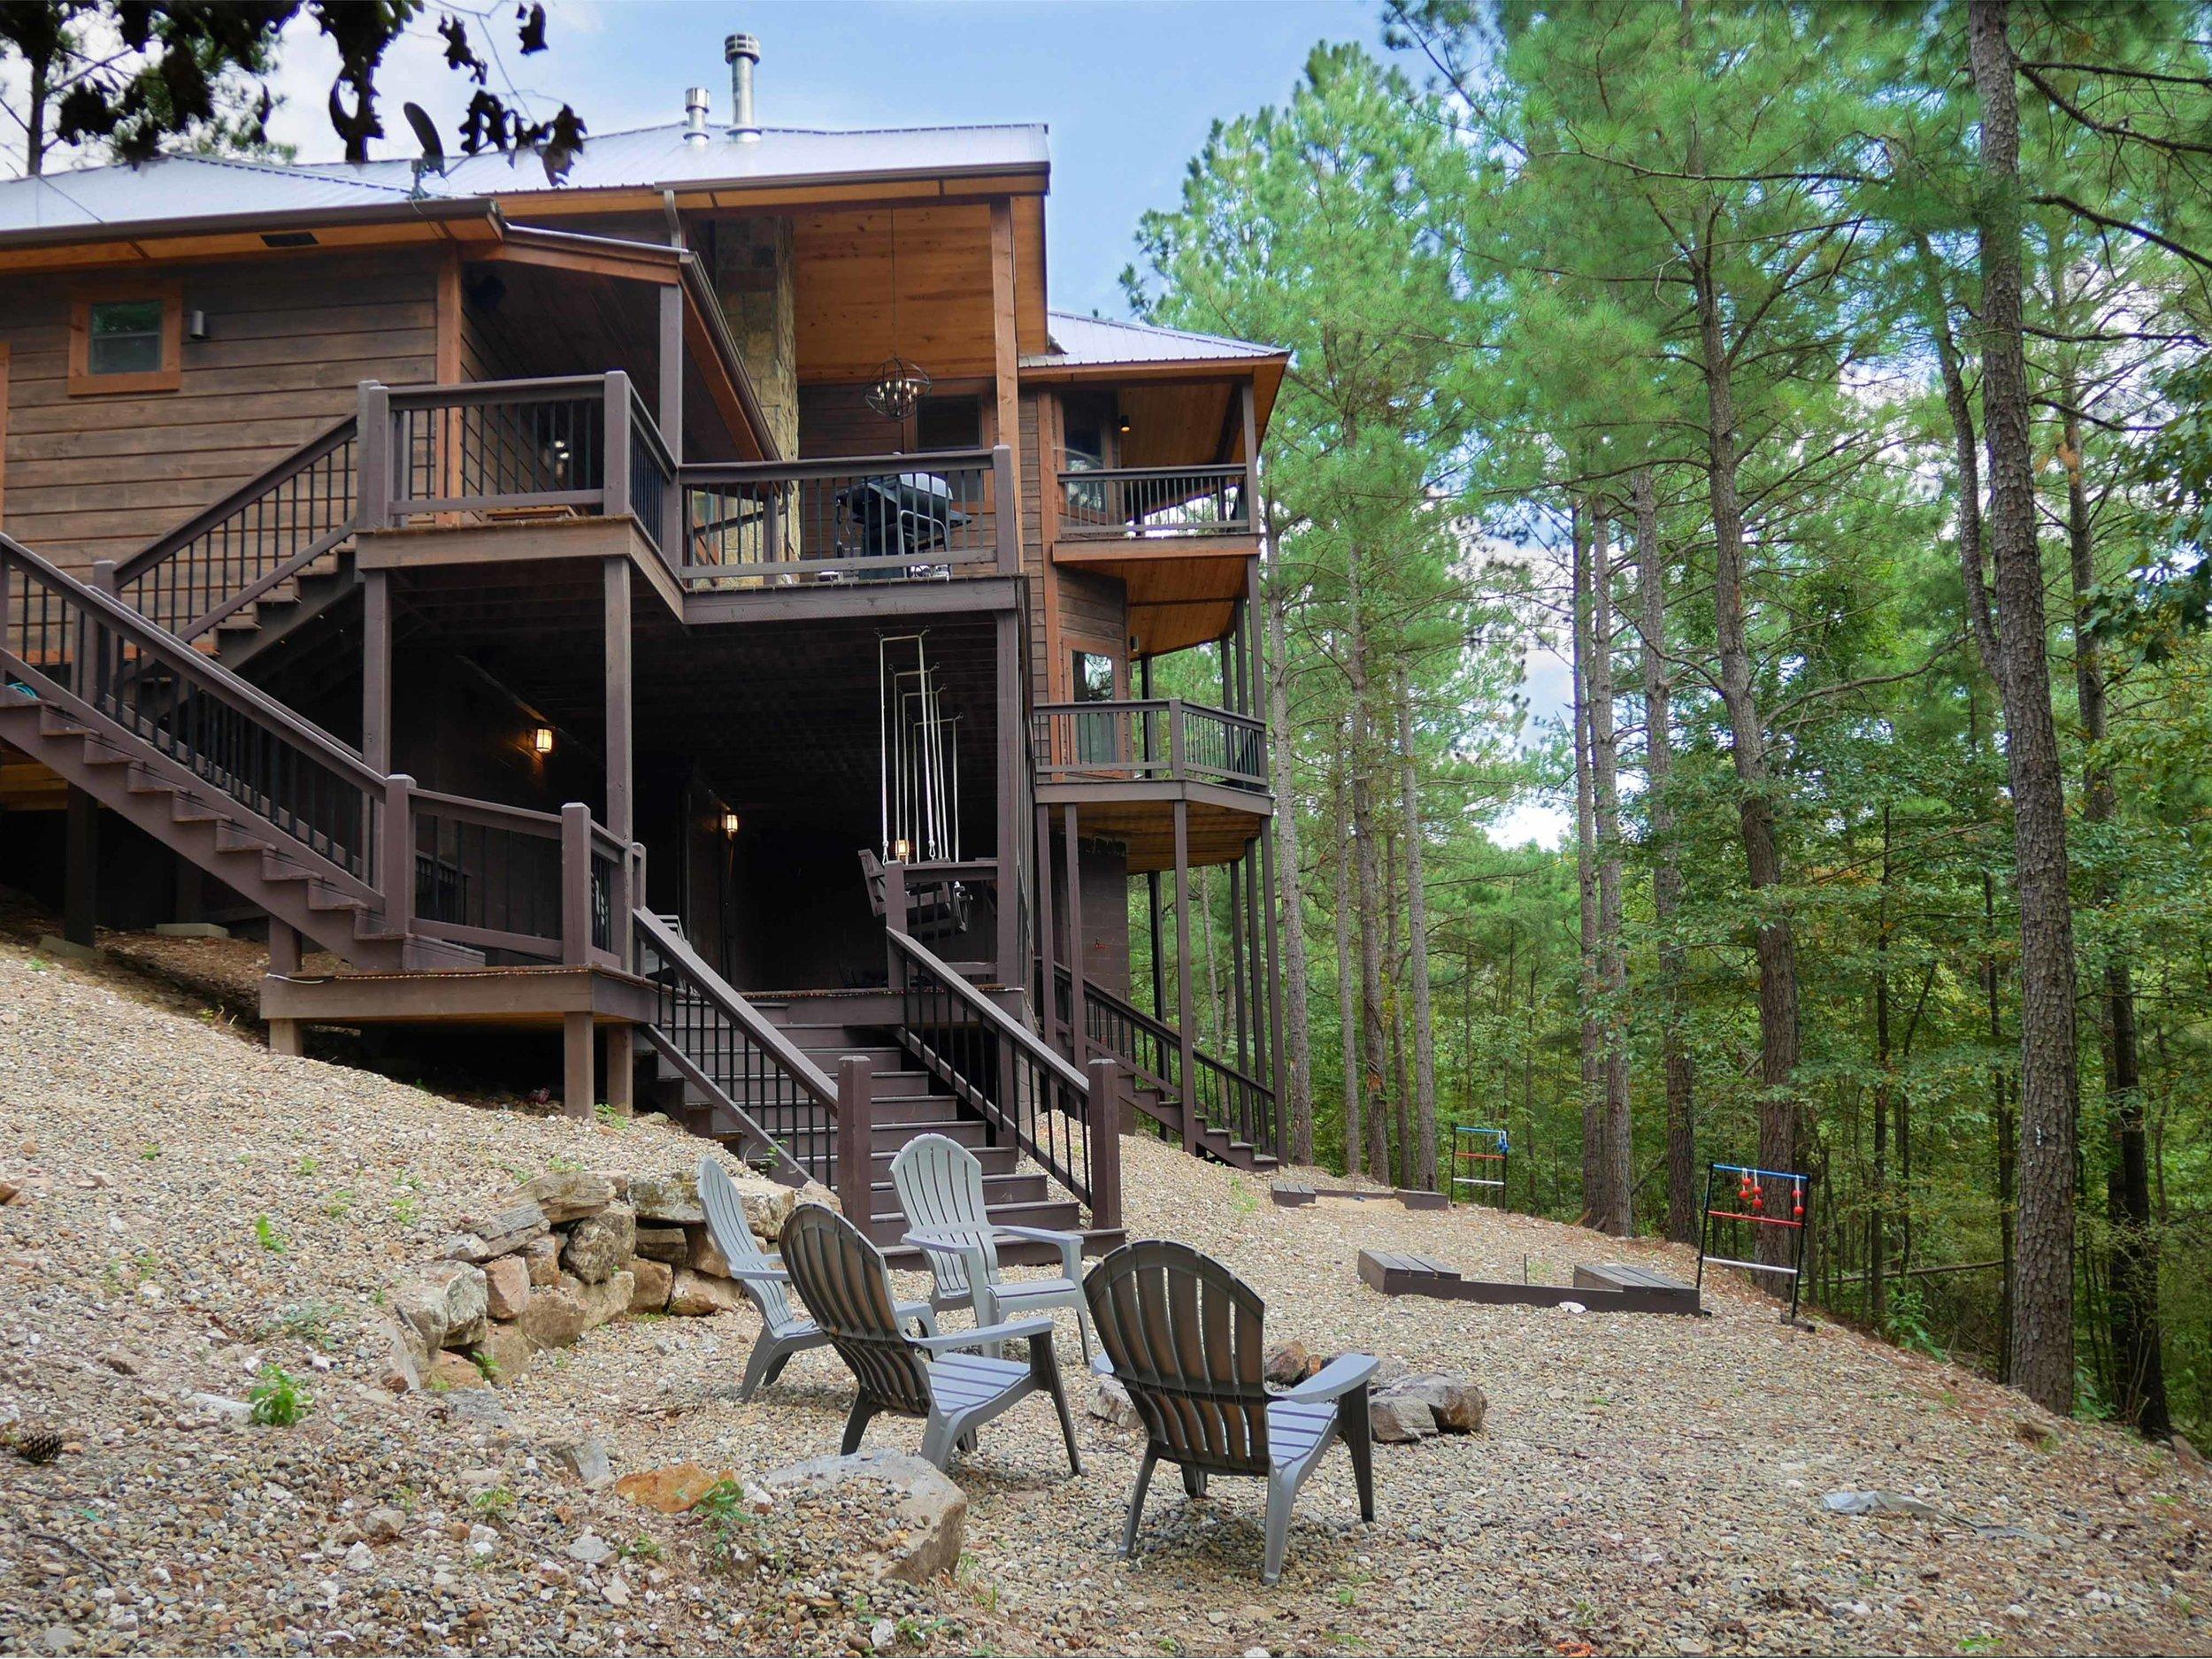 Rustic Mt Lodge - Firepit and Back Decks Horiz (Web).JPG